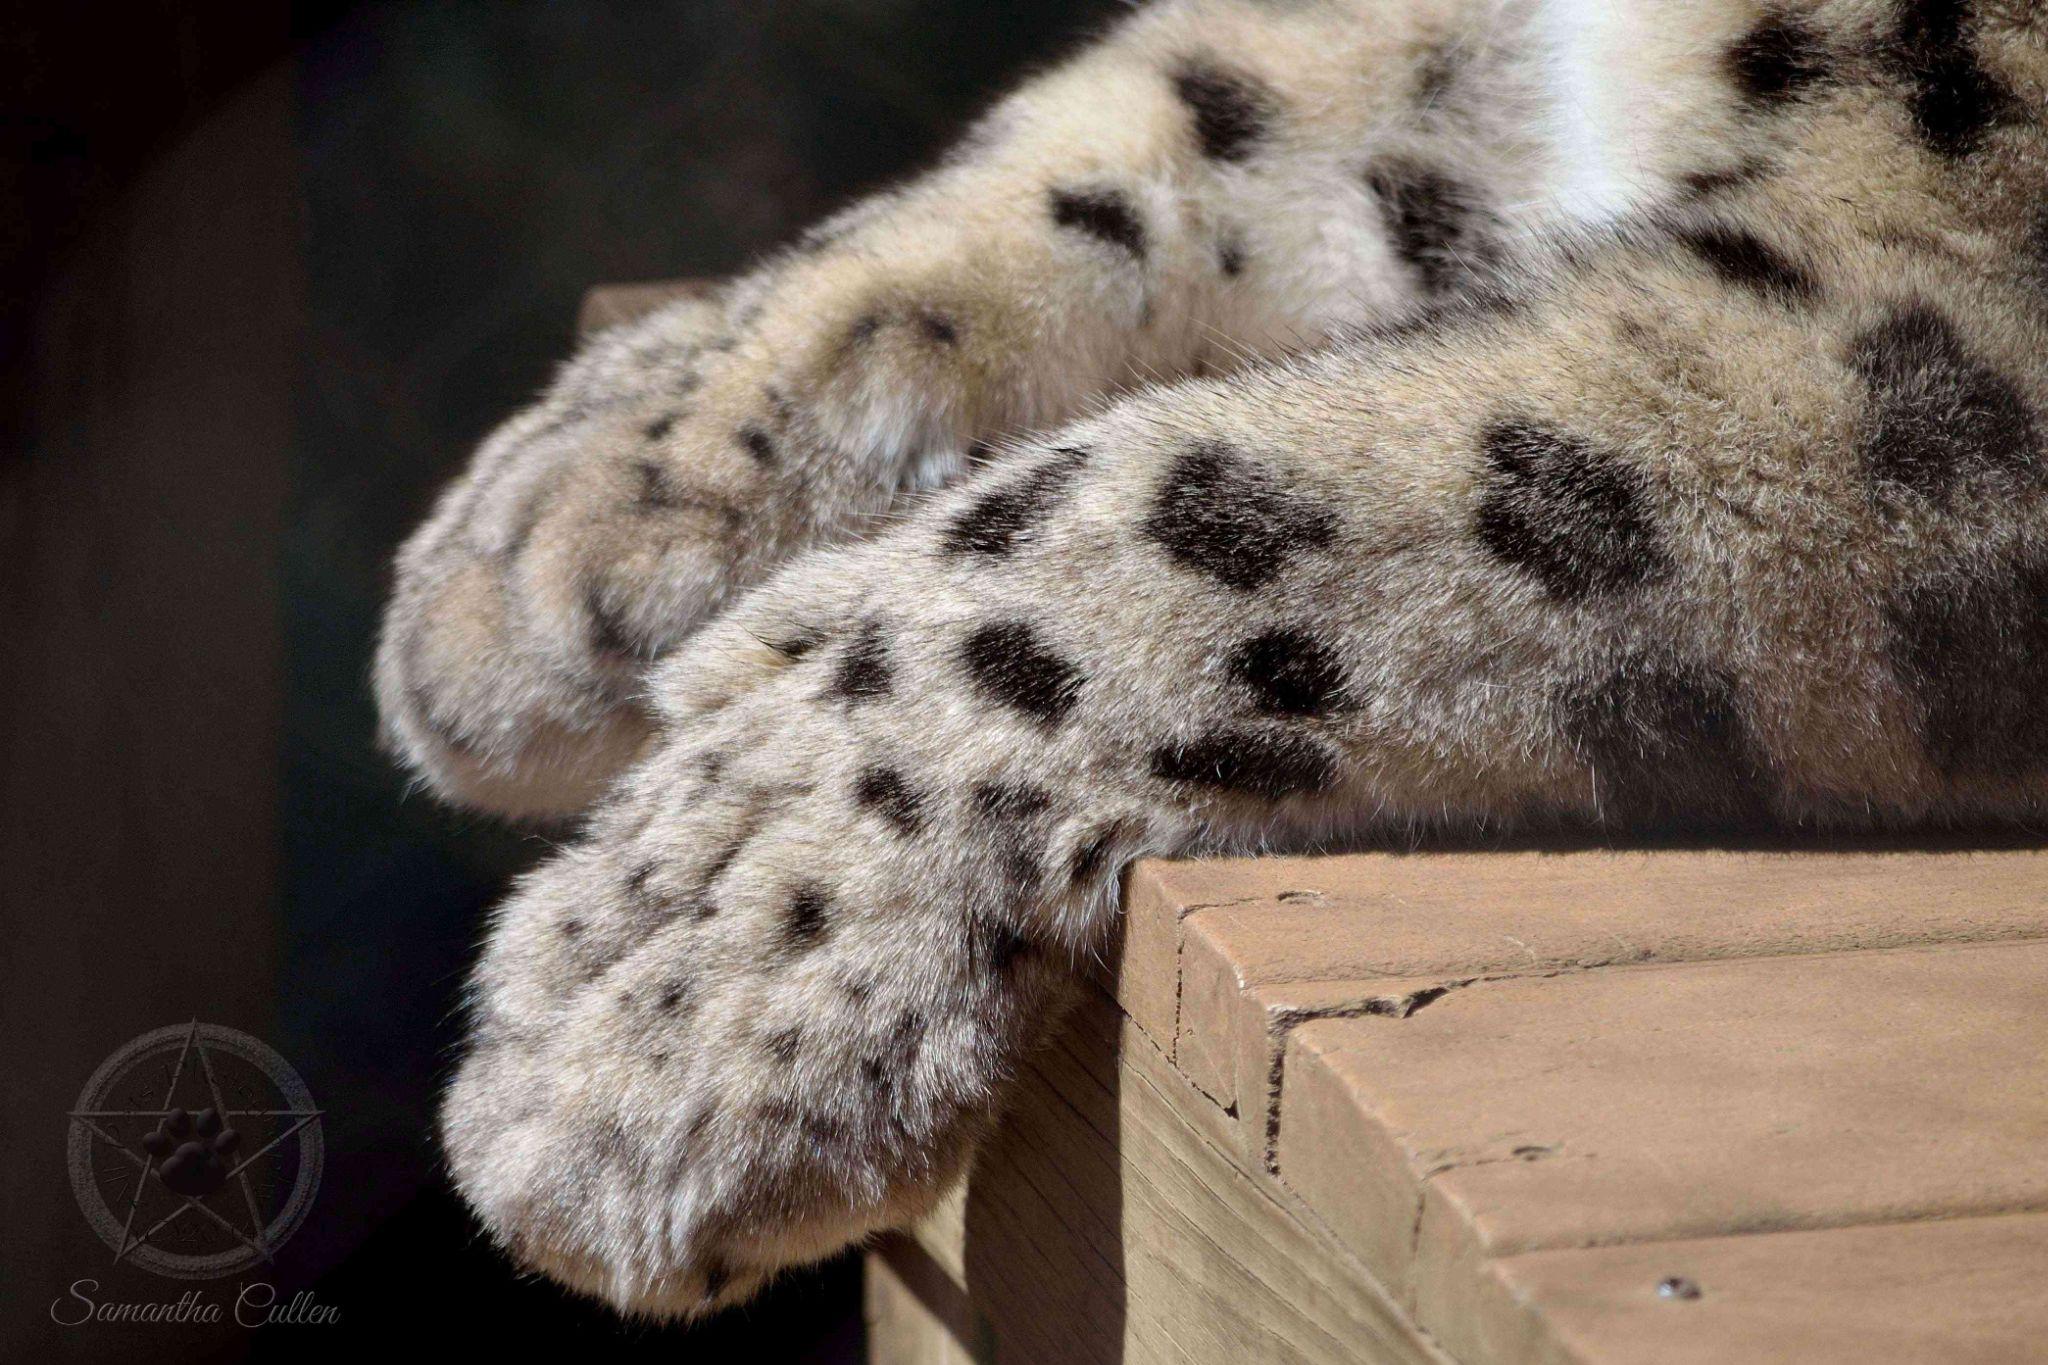 Paws by Samantha Cullen